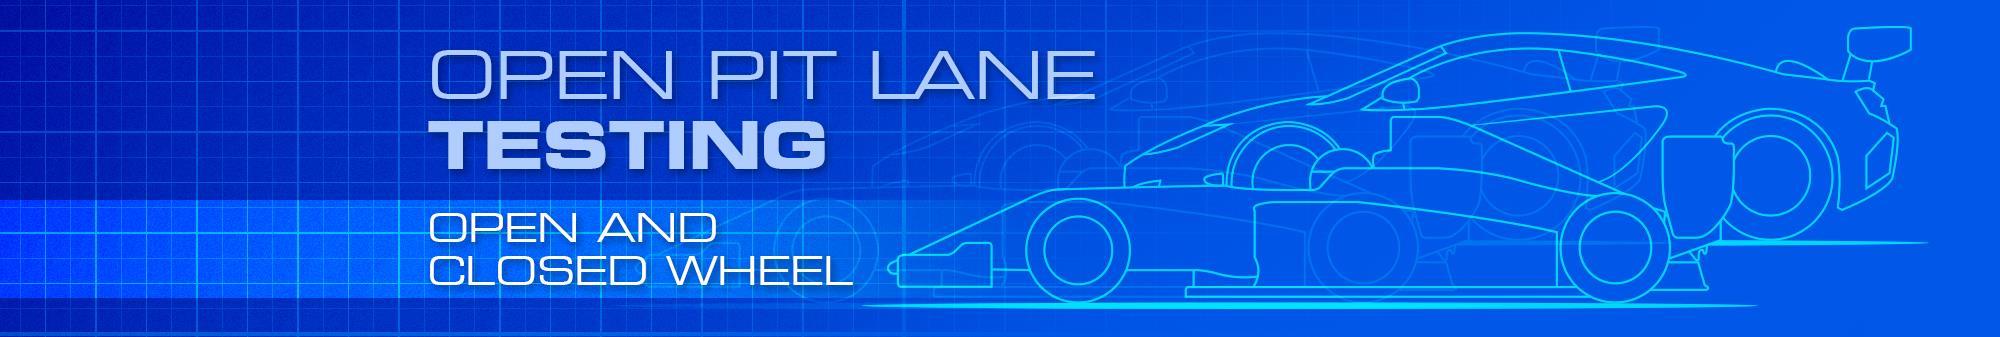 Open Pit-Lane Testing - £420